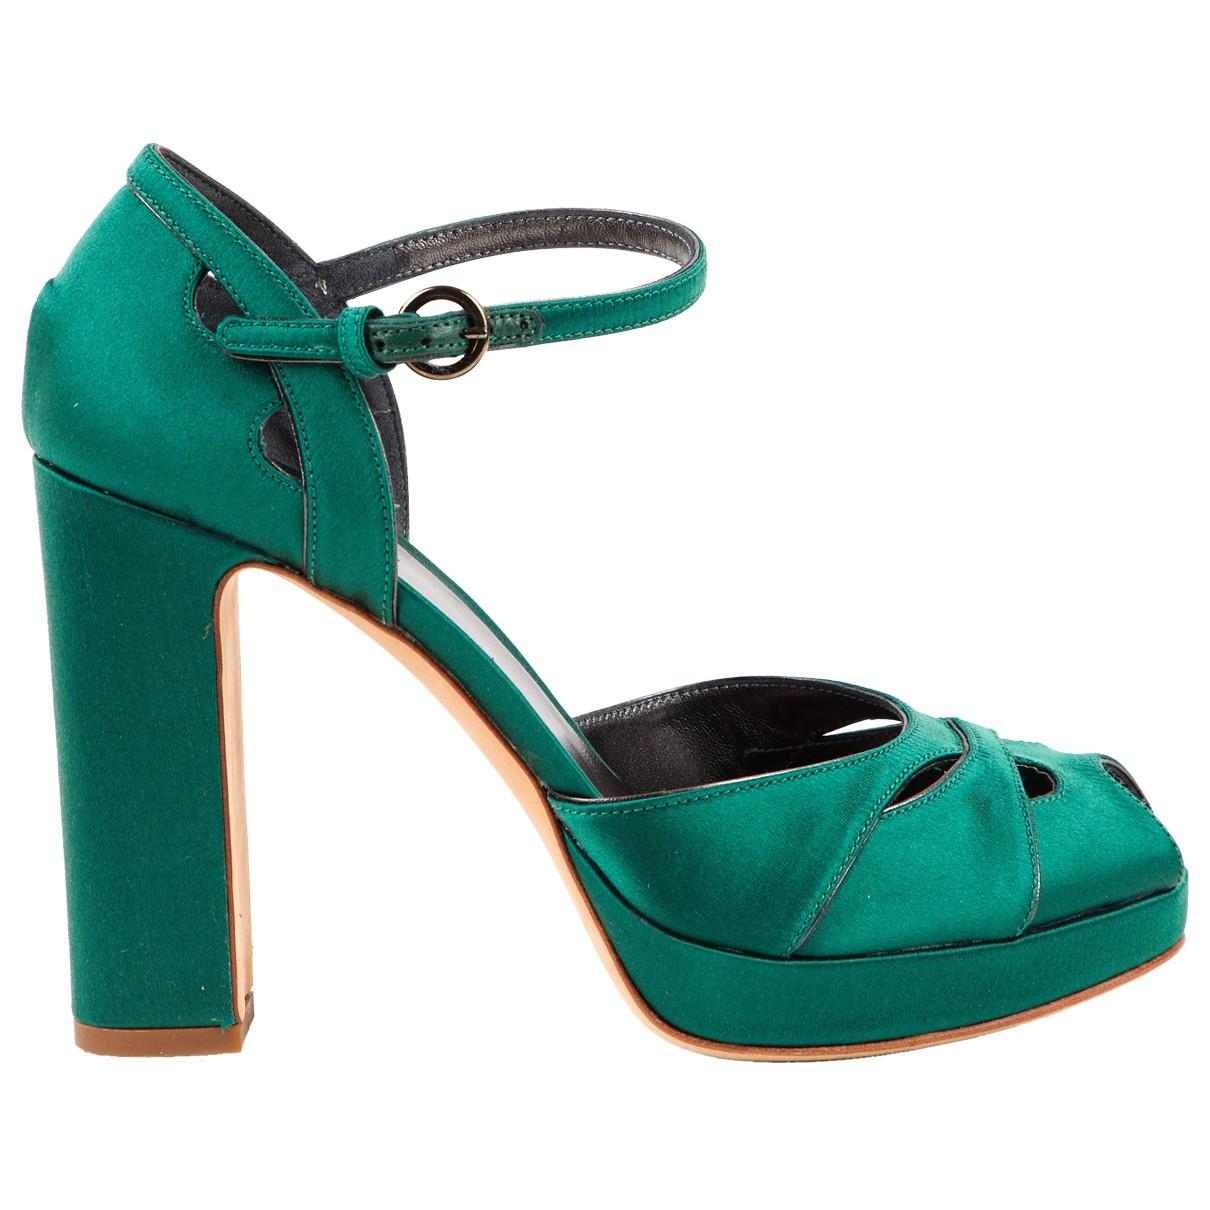 Miu Miu - Escarpins   pour femme en toile - vert